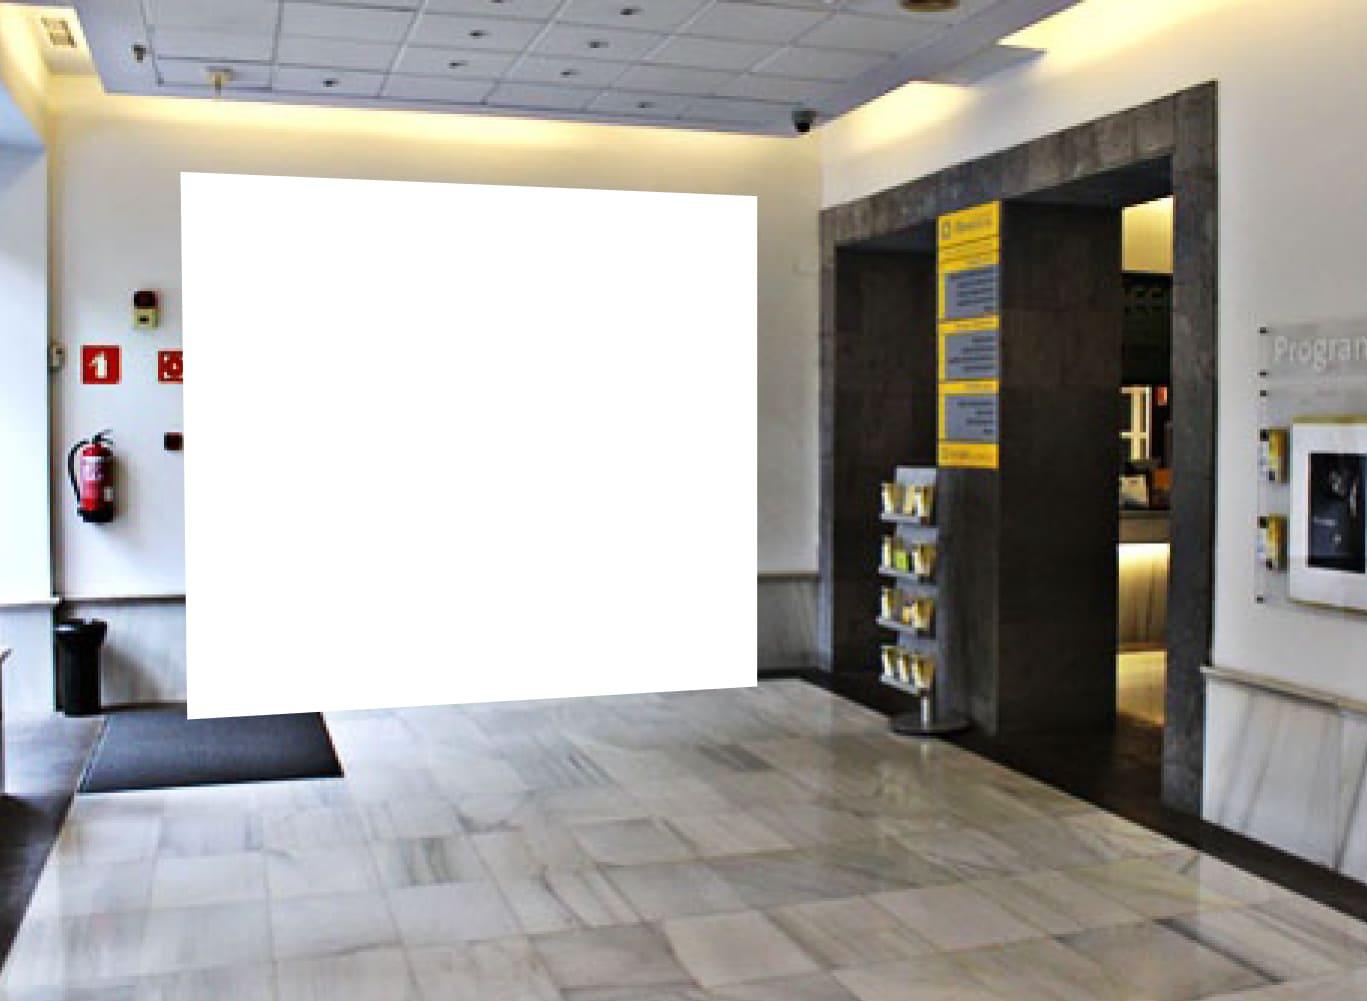 Photocall interior